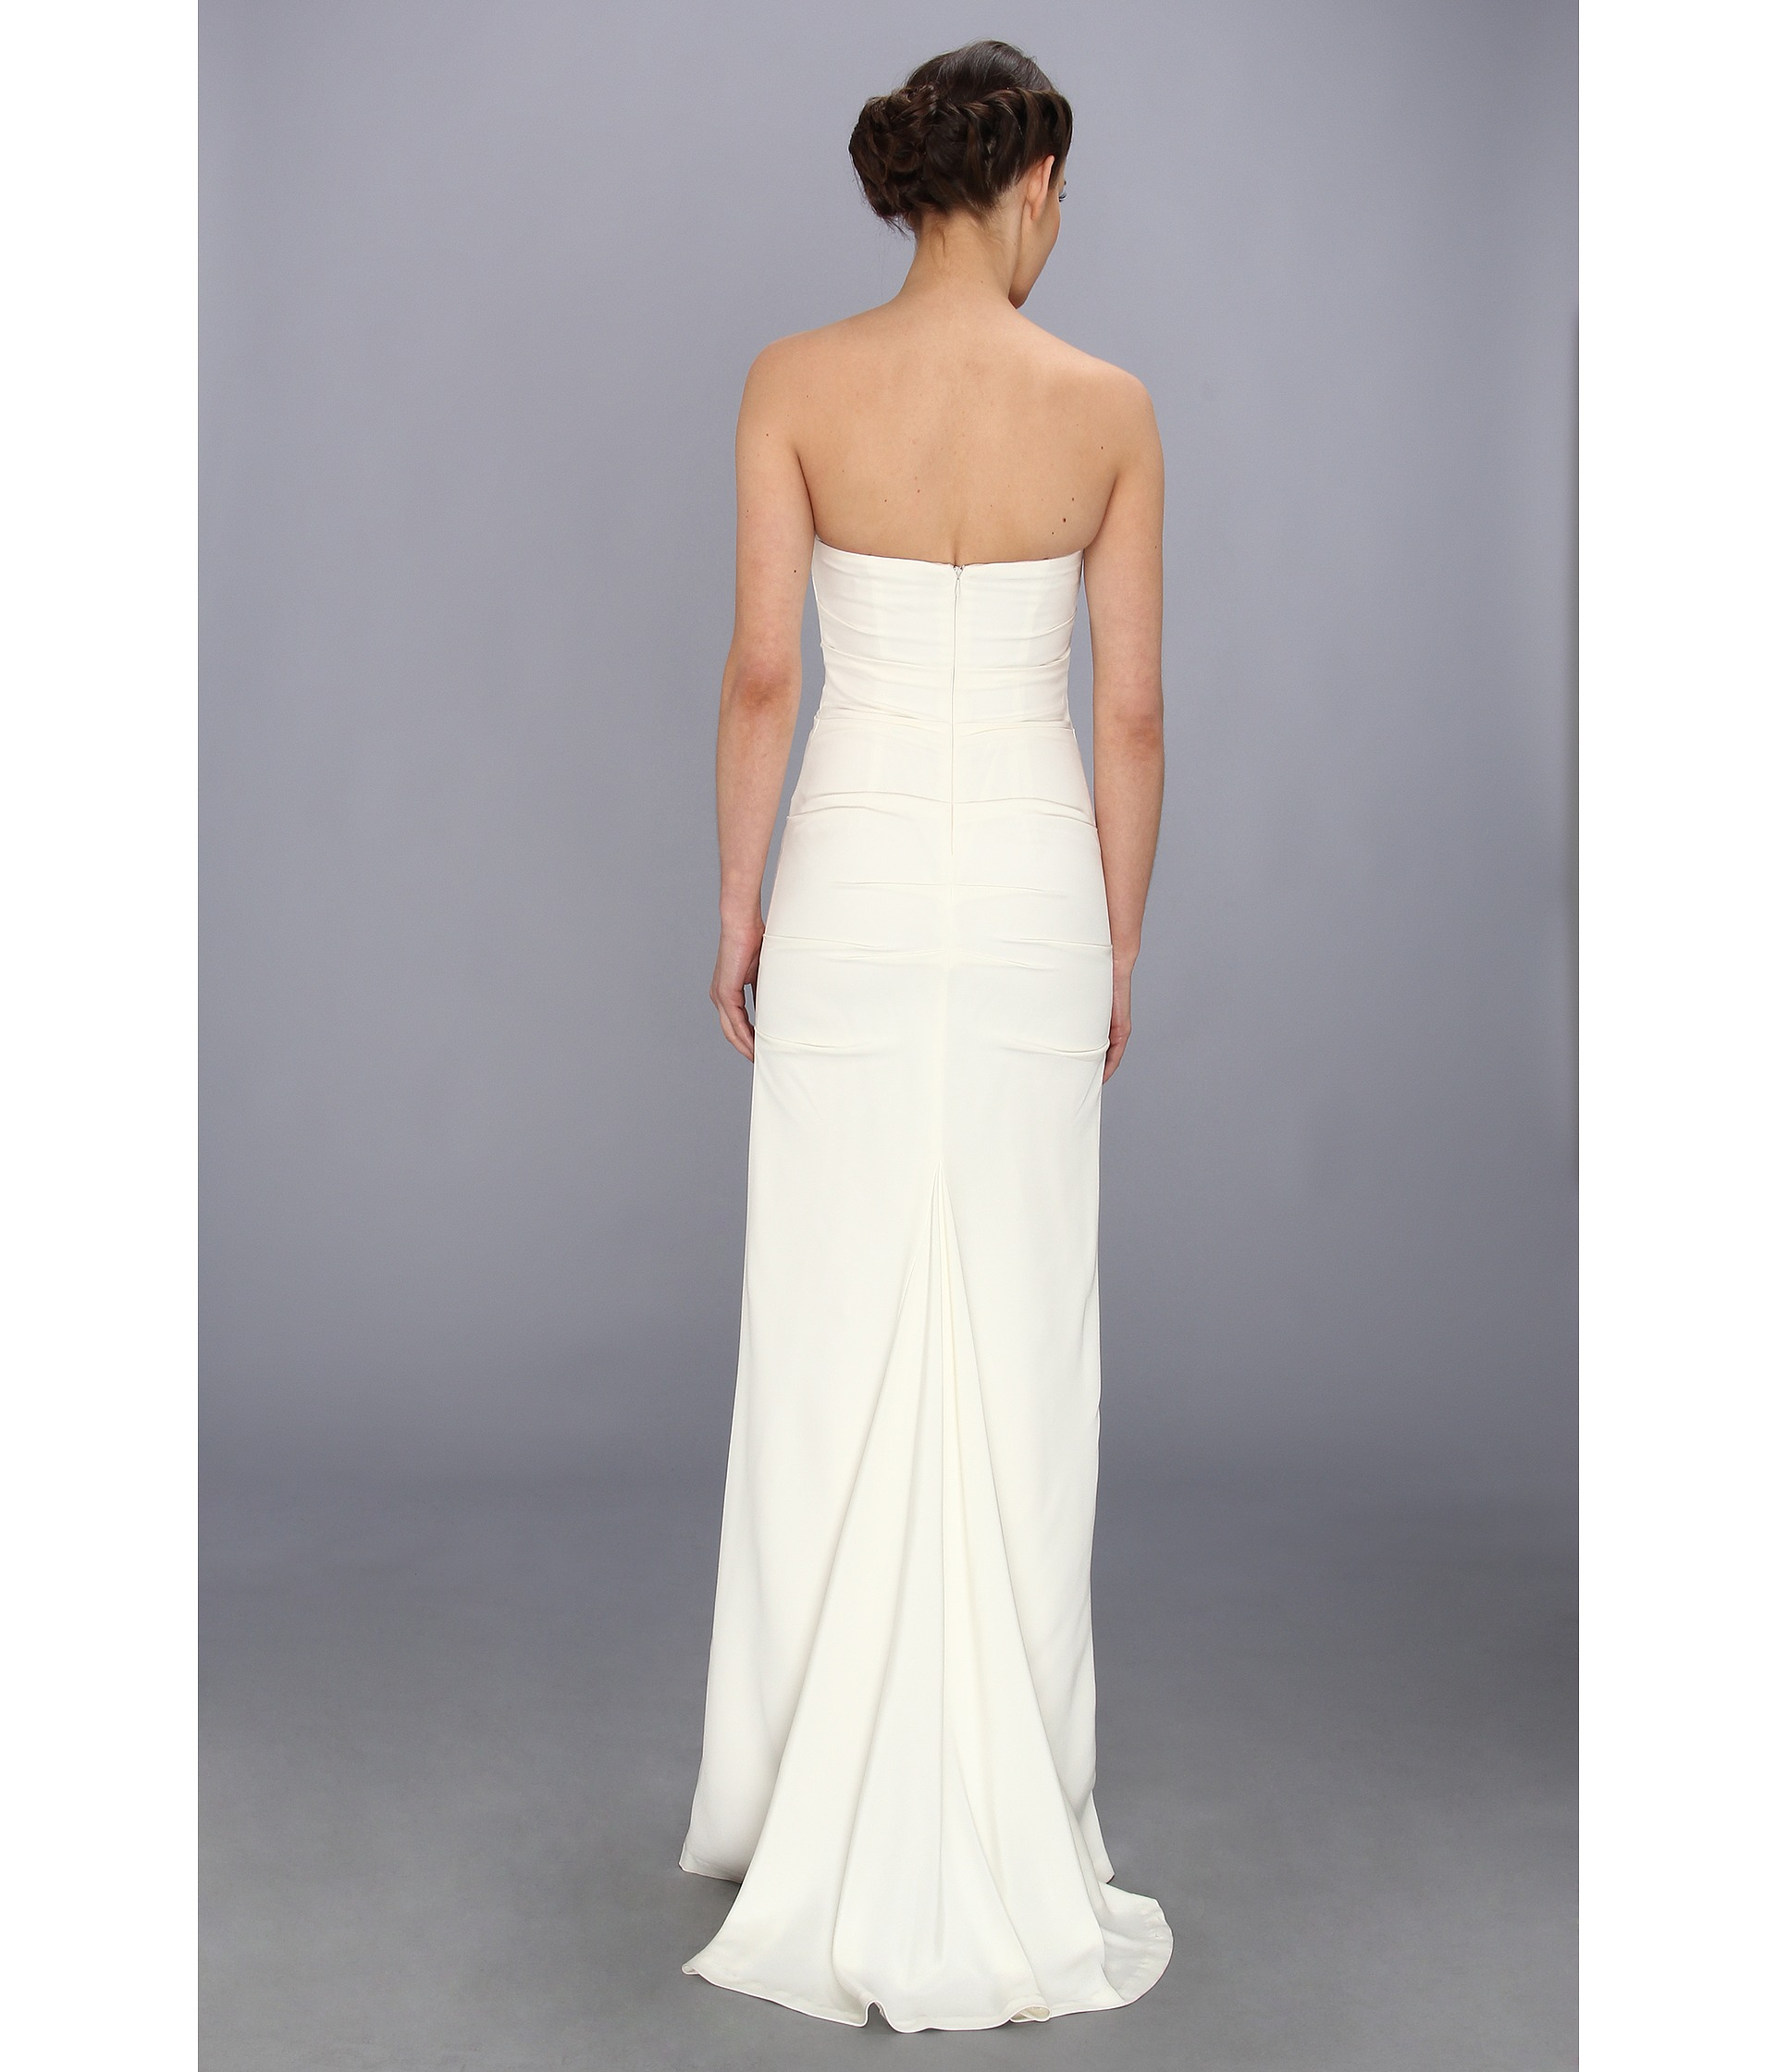 Nicole Miller Sleeveless Wedding Gown